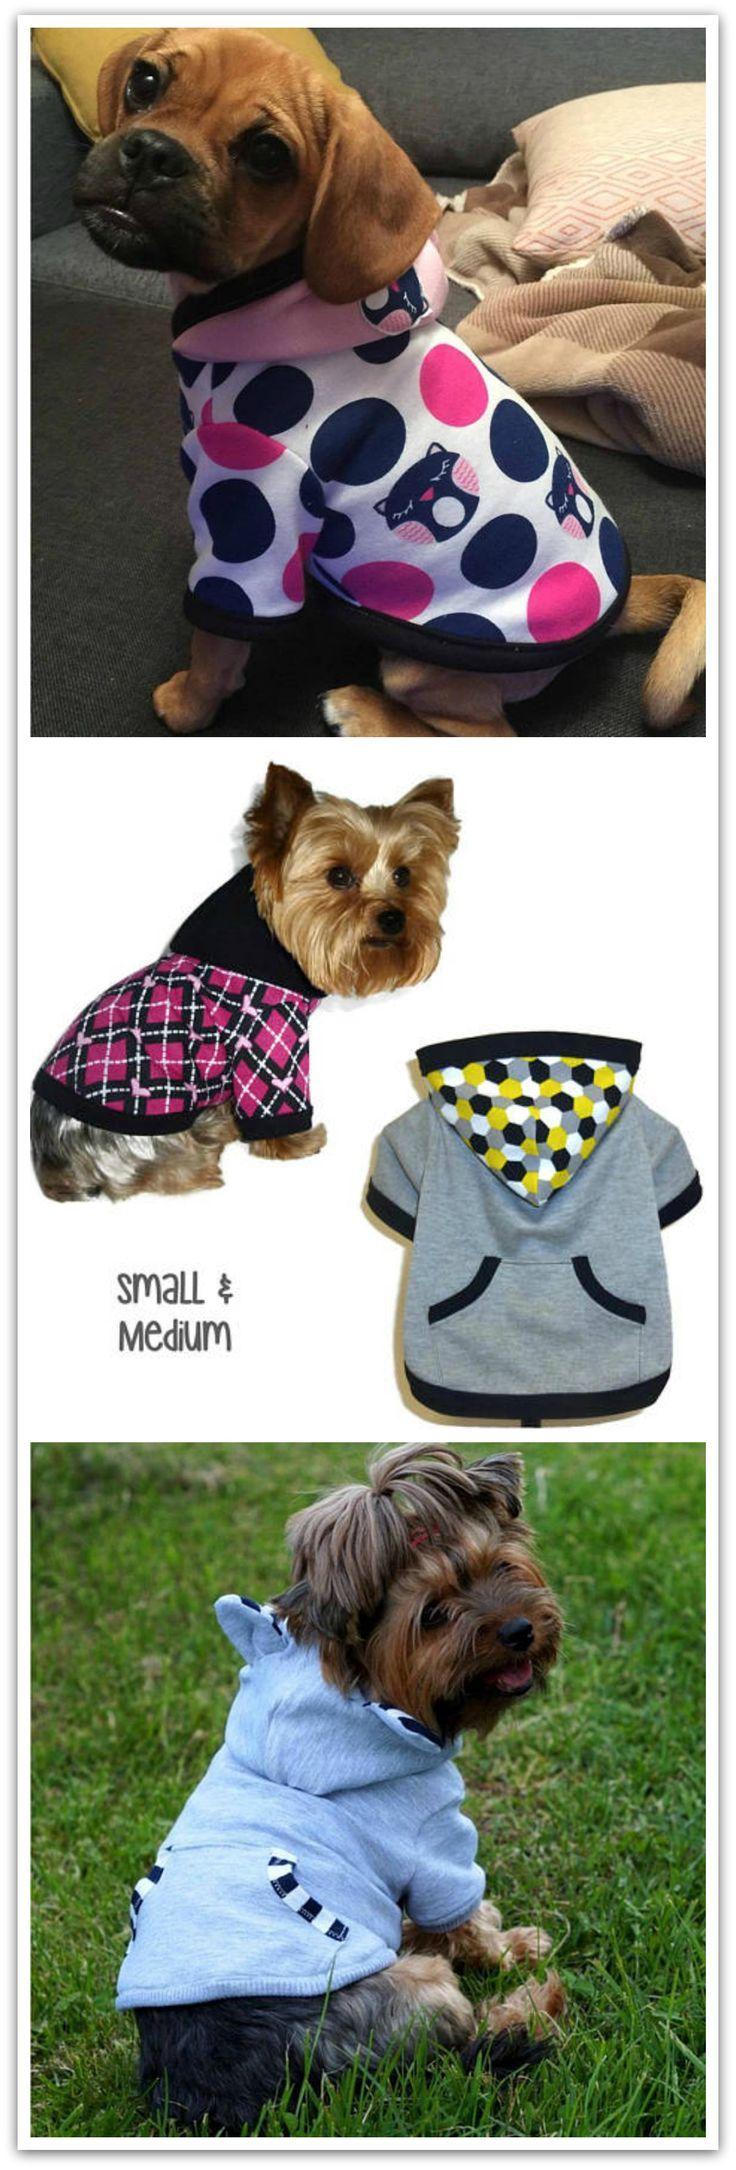 Dog hoodie pattern 1761 small medium dog clothes sewing dog hoodie pattern 1761 small medium dog clothes sewing pattern dog jacket jeuxipadfo Image collections